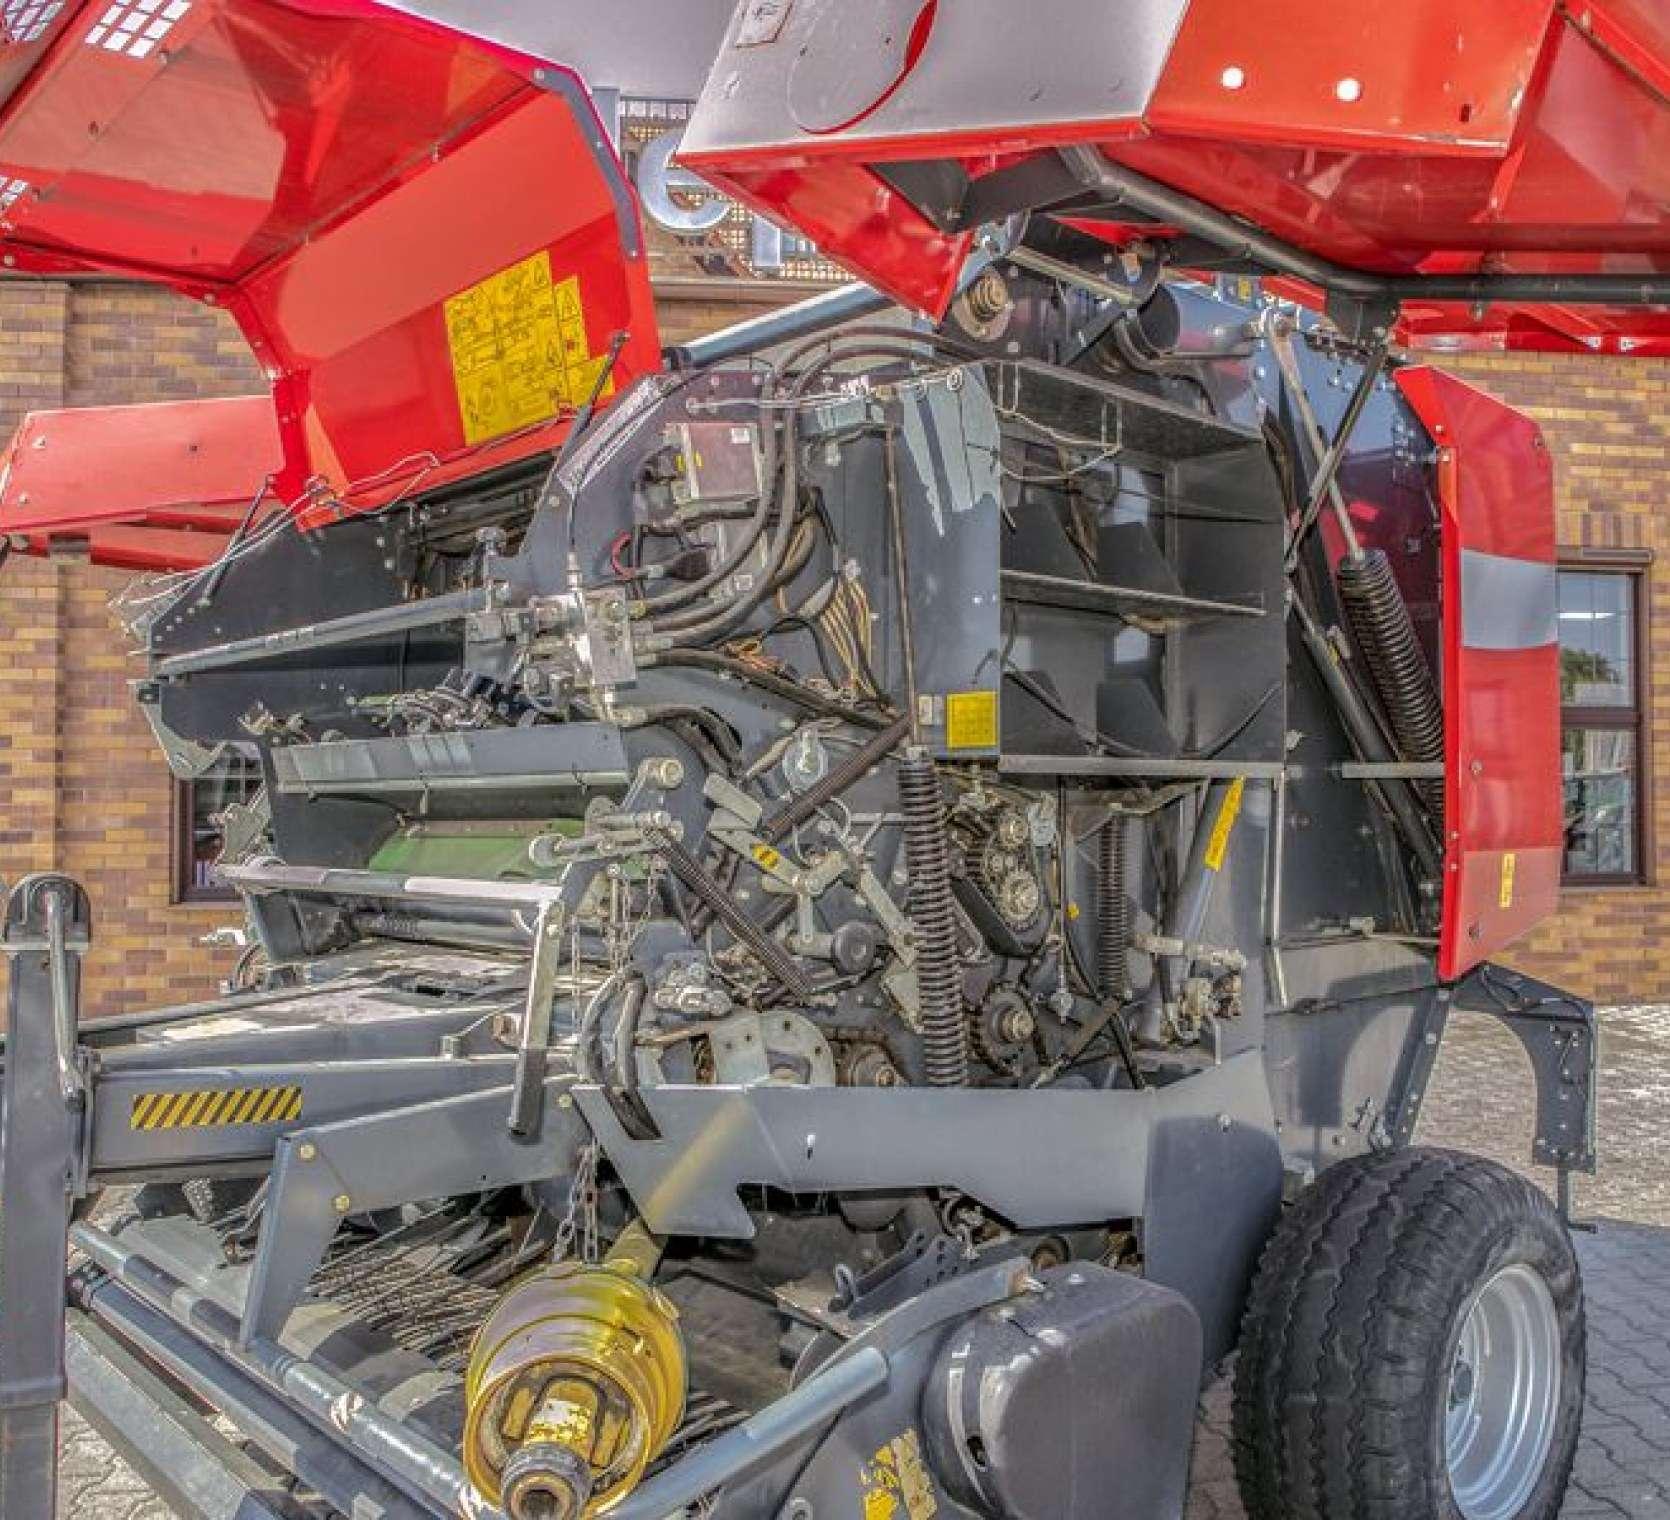 Massey Ferguson model 167 V prasa z terminalem obsługowym okazja korbanek.pl